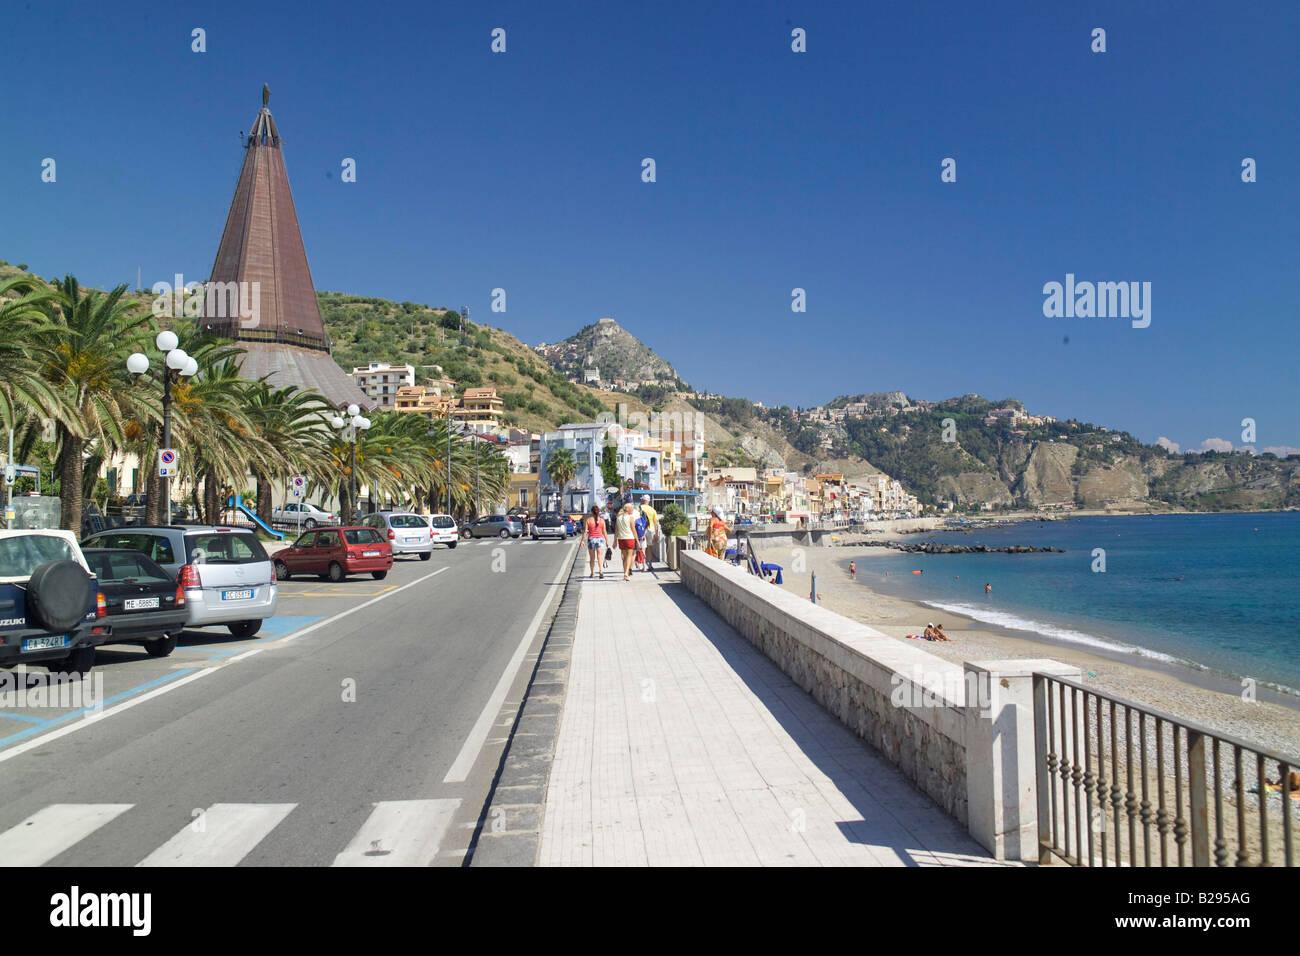 Promenade giardini naxos near taormina sicily stock photo royalty free image 18641464 alamy - B b giardini naxos economici ...